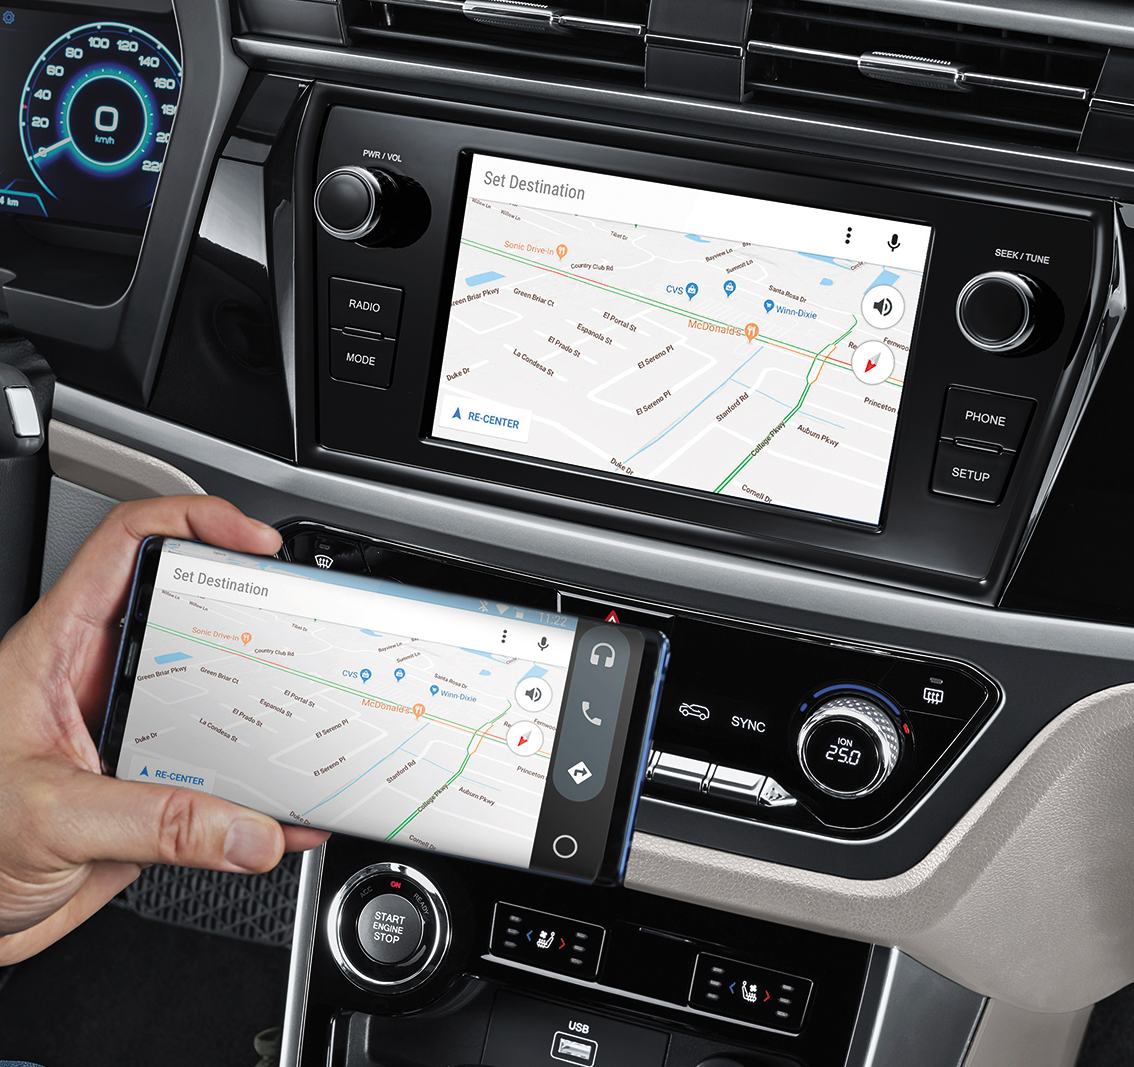 SsangYong New Tivoli - Apple CarPlay